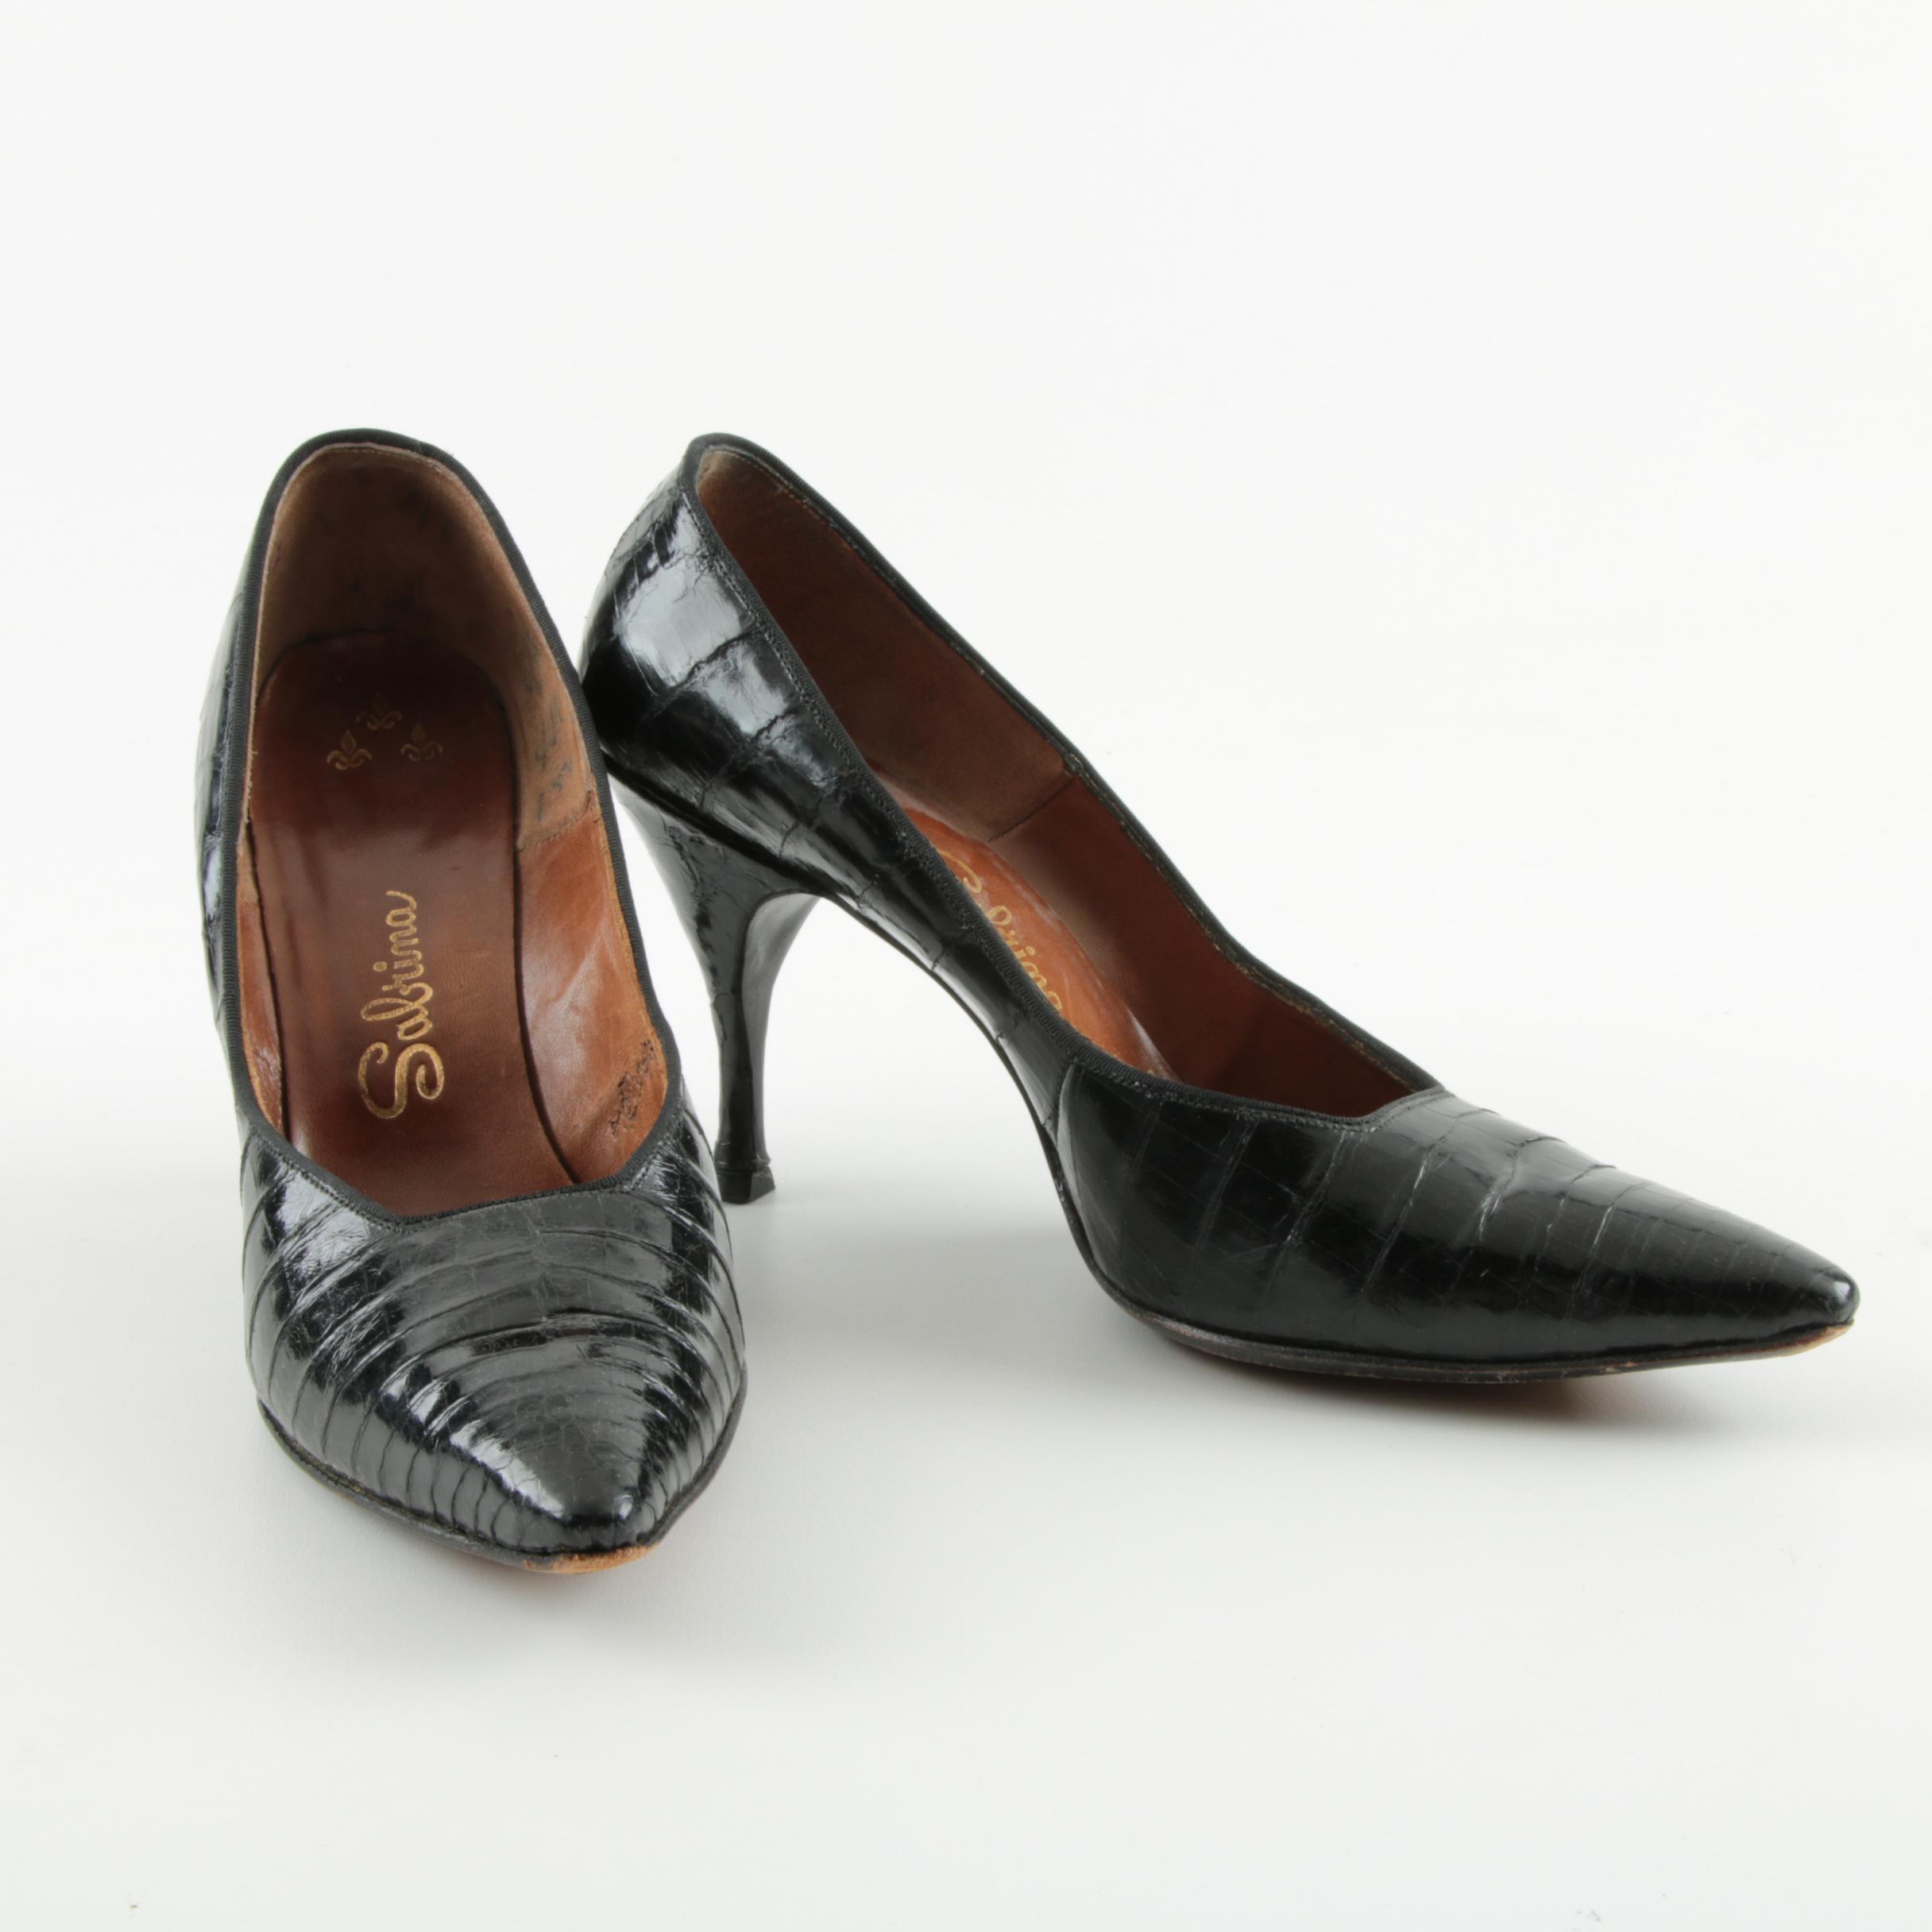 Vintage Sabrina Black High Heel Pumps